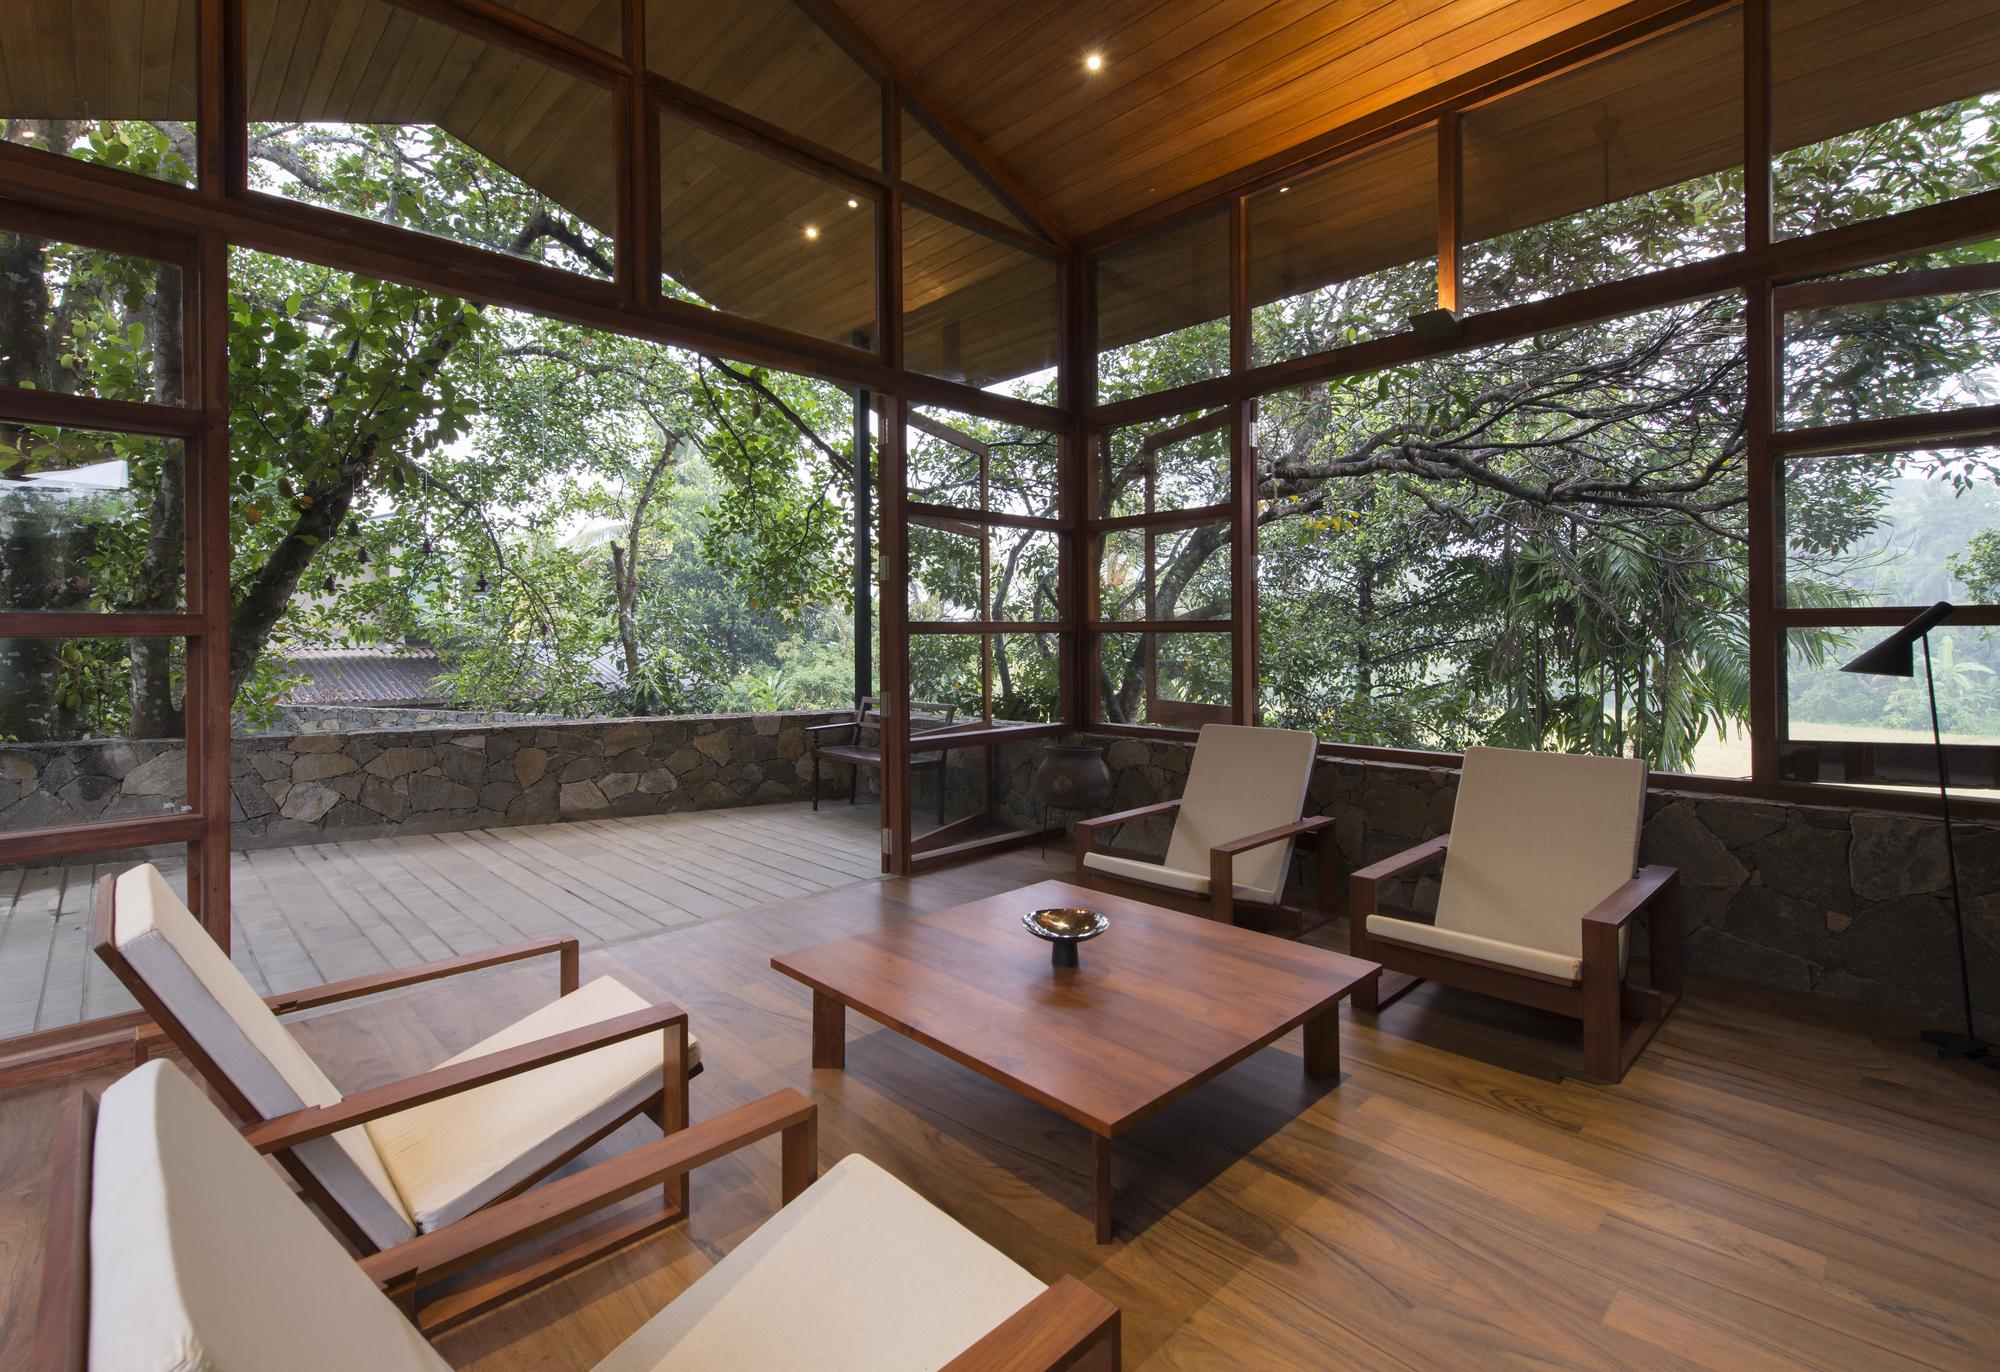 Family Retreat For Devasiris Palinda Kannangara Architects ArchDaily